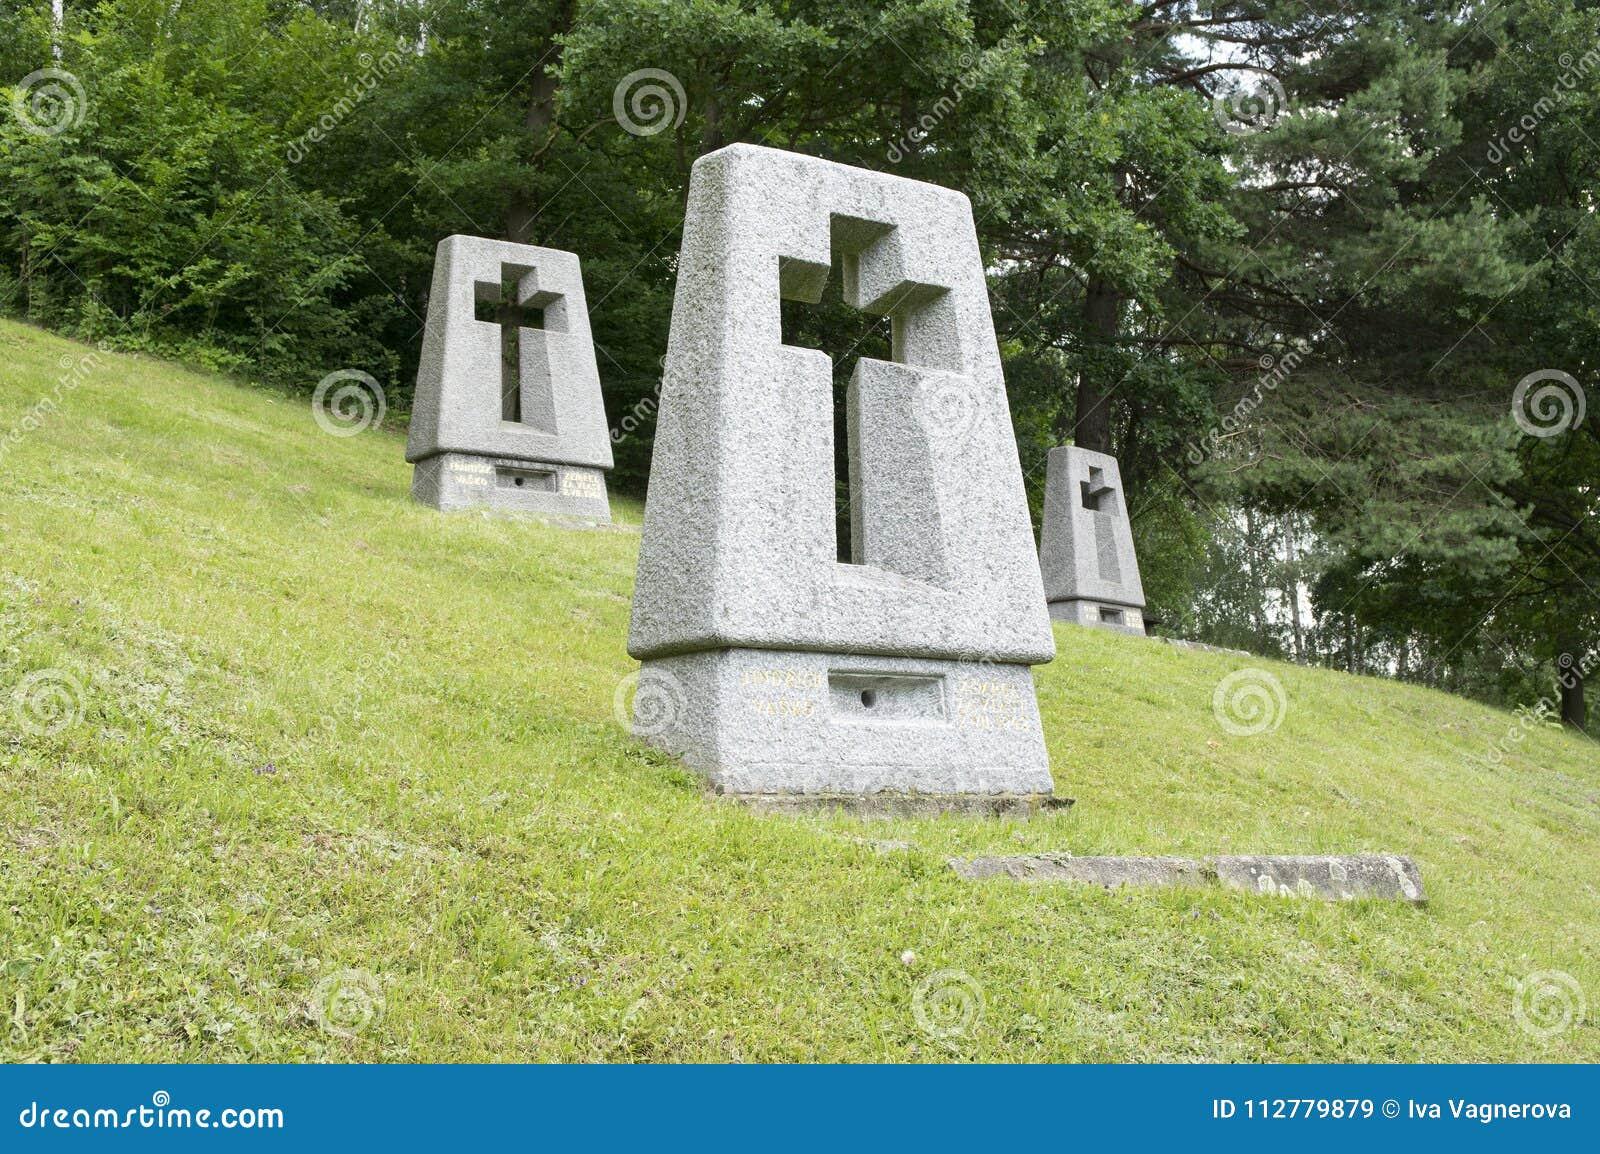 Lezaky纪念碑,在草甸的坟墓